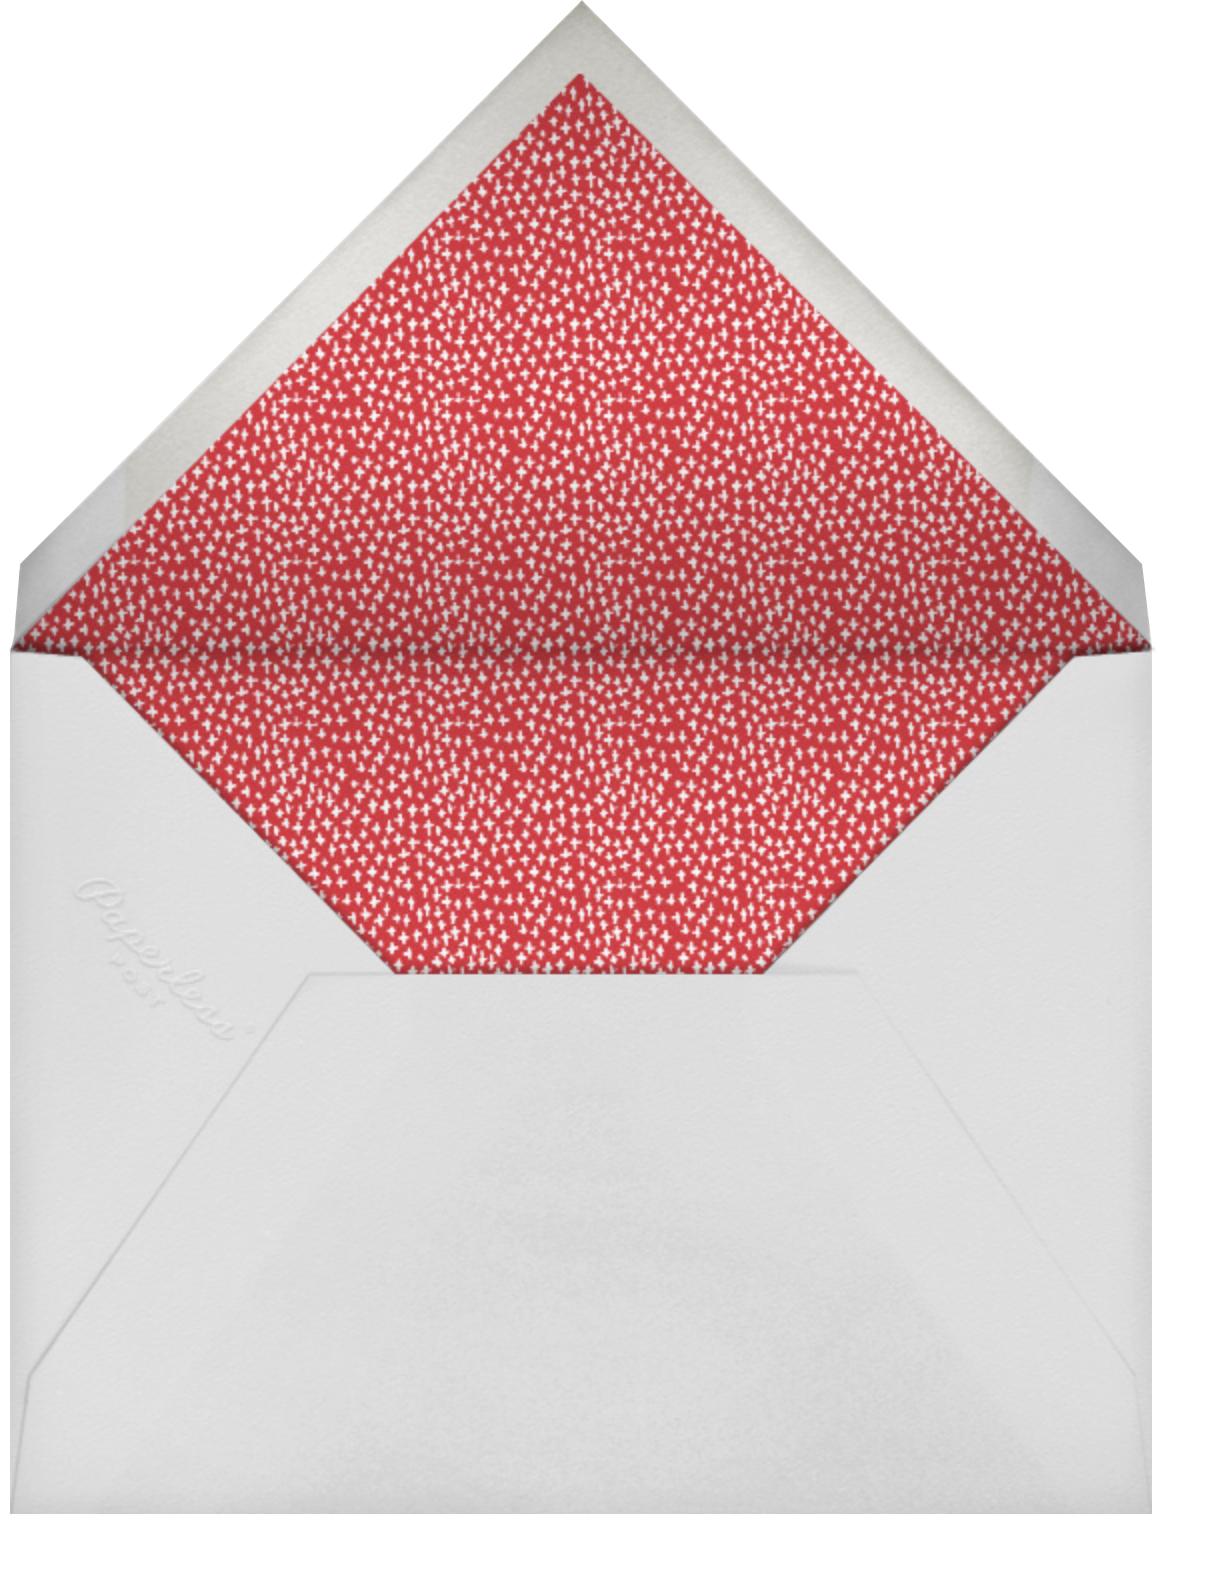 The Little One Has Perfect Pitch - Mr. Boddington's Studio - Envelope